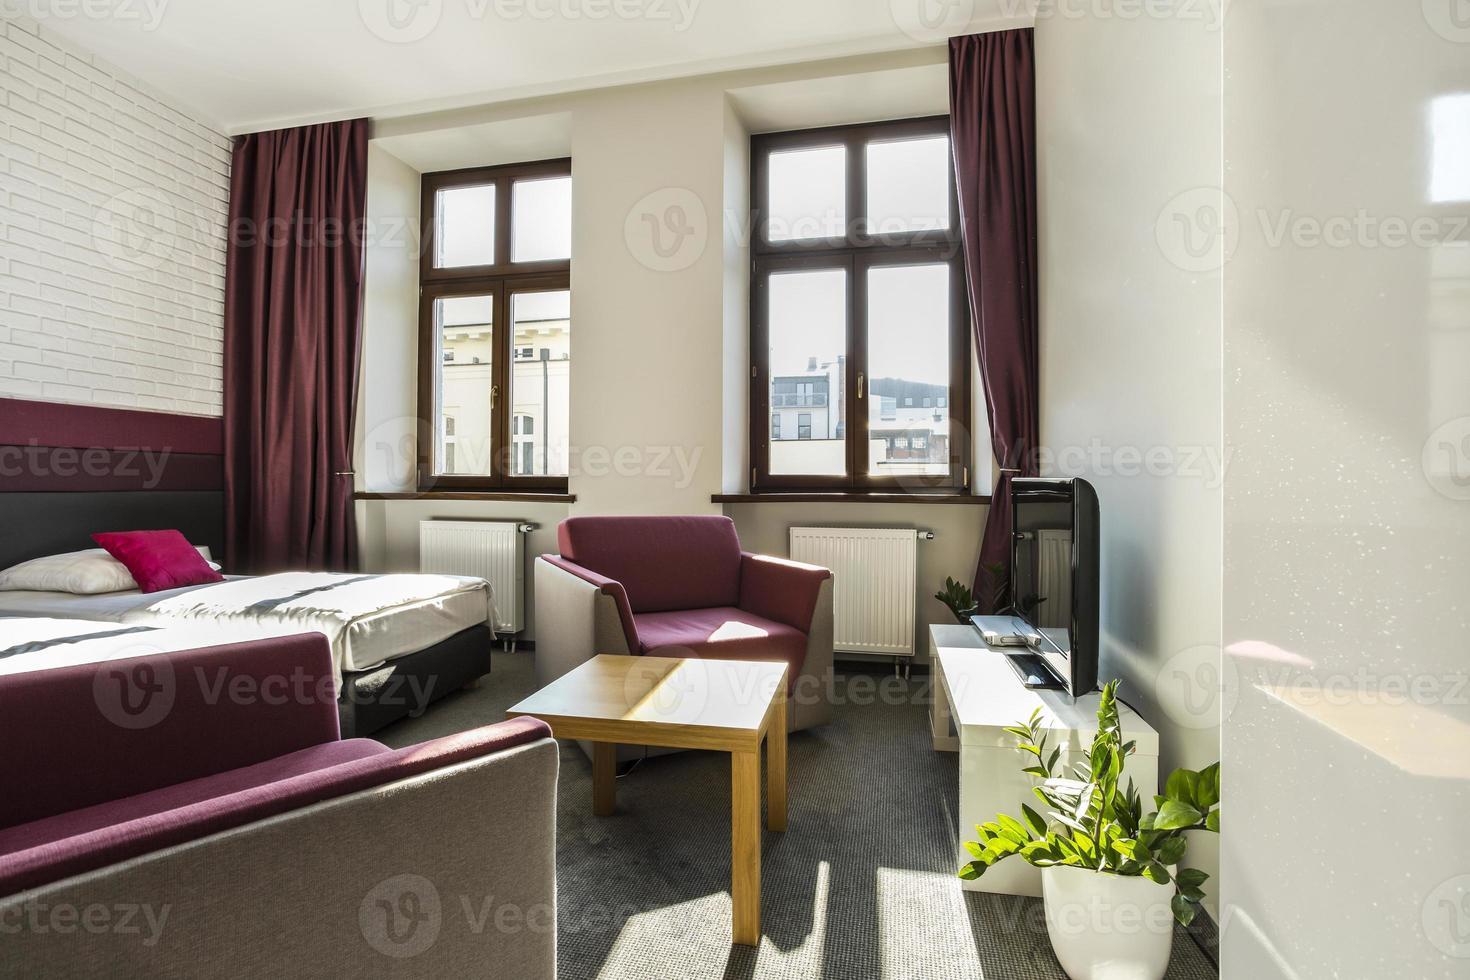 camera d'albergo moderna con tema viola foto